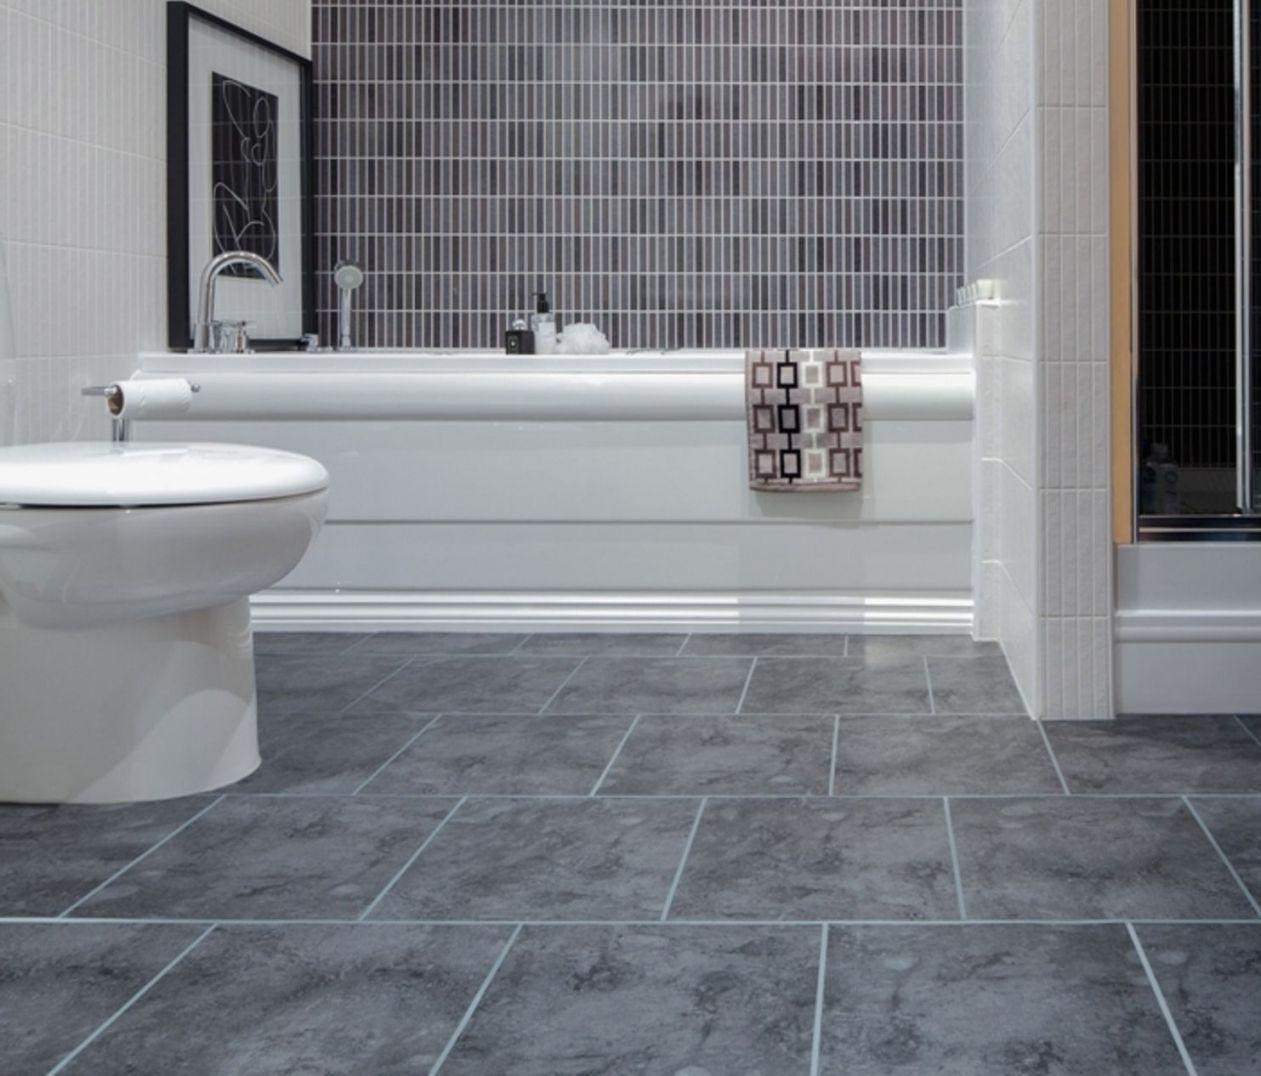 Bathroom Extraordinary Navy Blue Bathroom Floor Tiles Cute Bathroom Inspiration Decorating Small Re Grey Bathroom Tiles Bathroom Vinyl Gray Tile Bathroom Floor